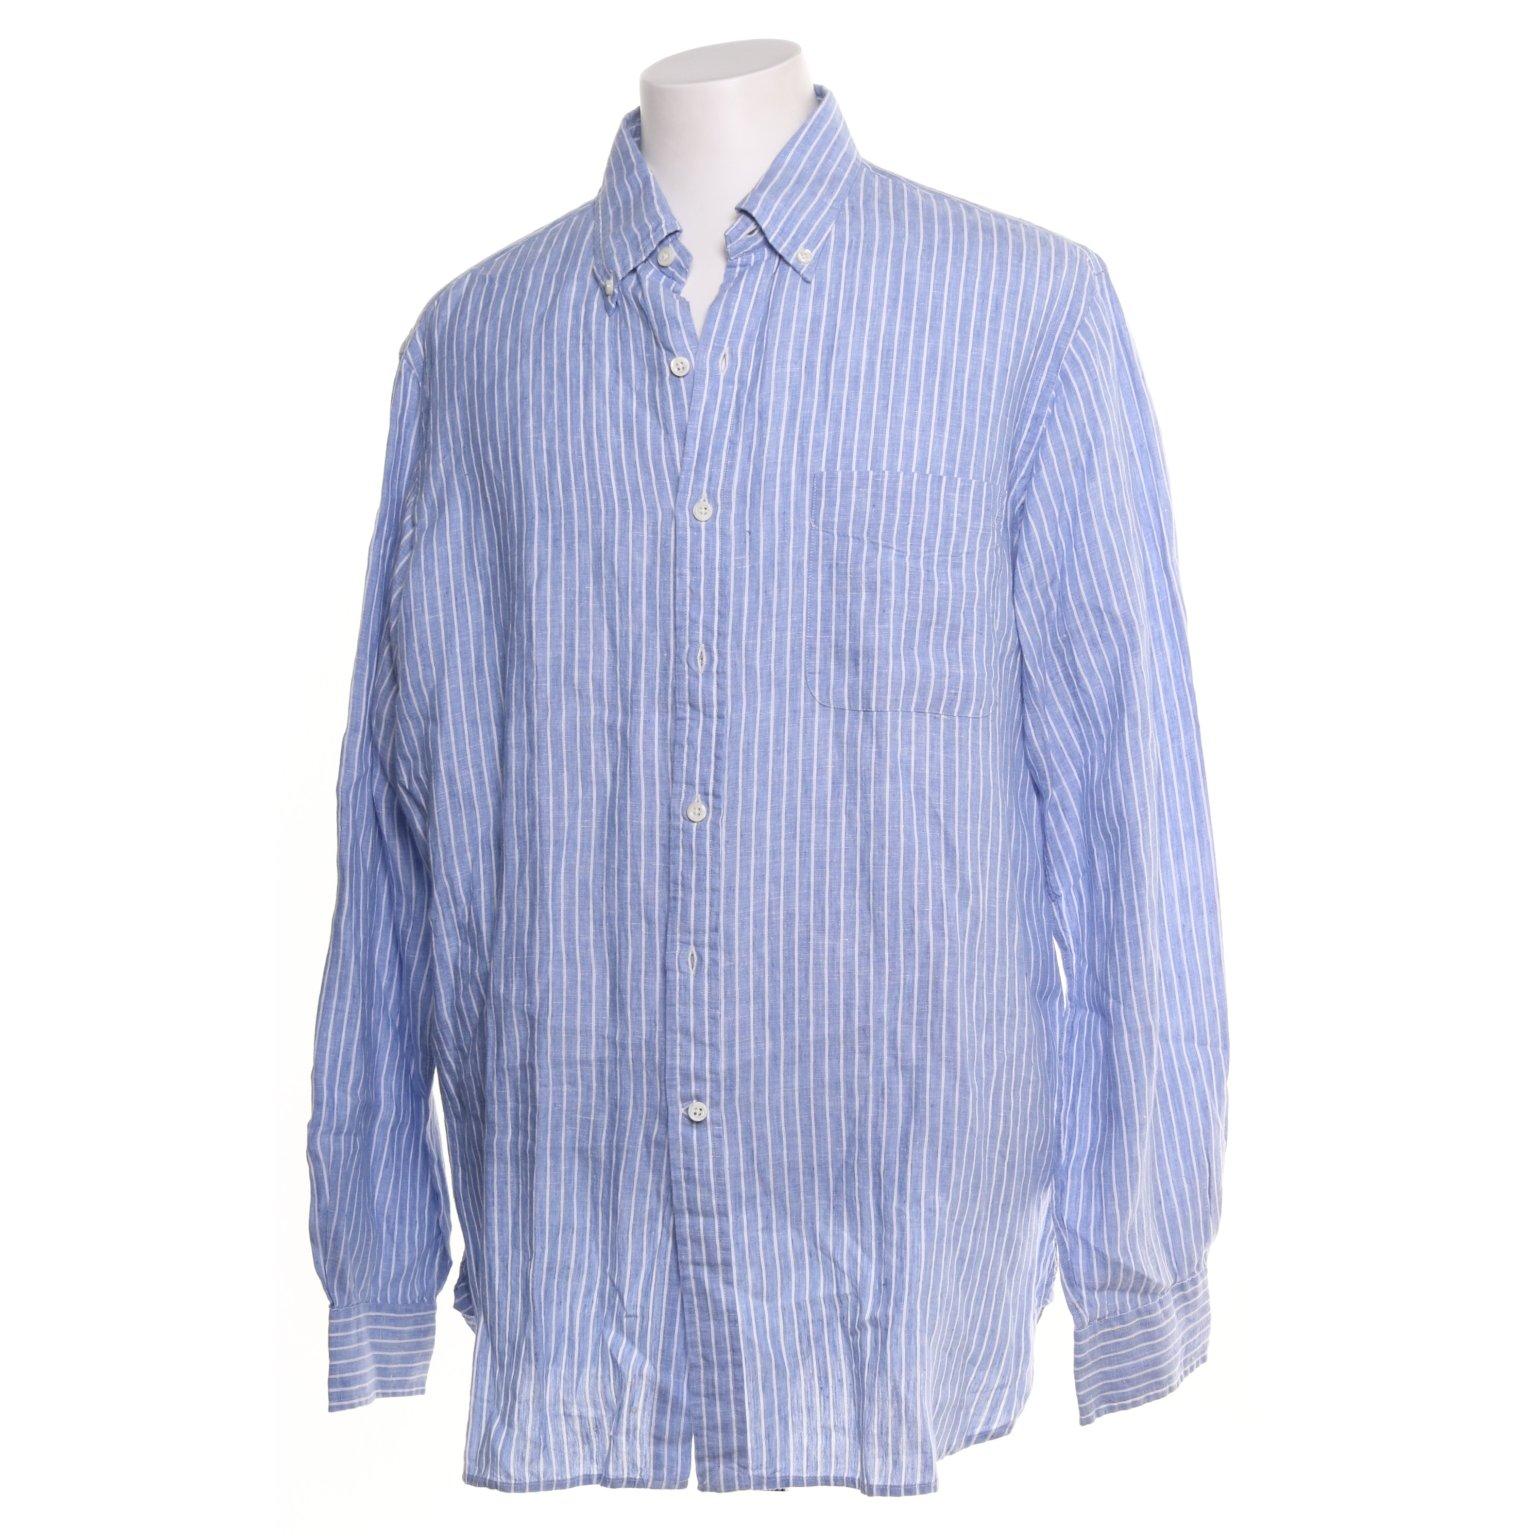 61f34261ae5b Ralph Lauren, Buttondown-skjorta, Strl: X.. (353487088) ᐈ Sellpy på ...